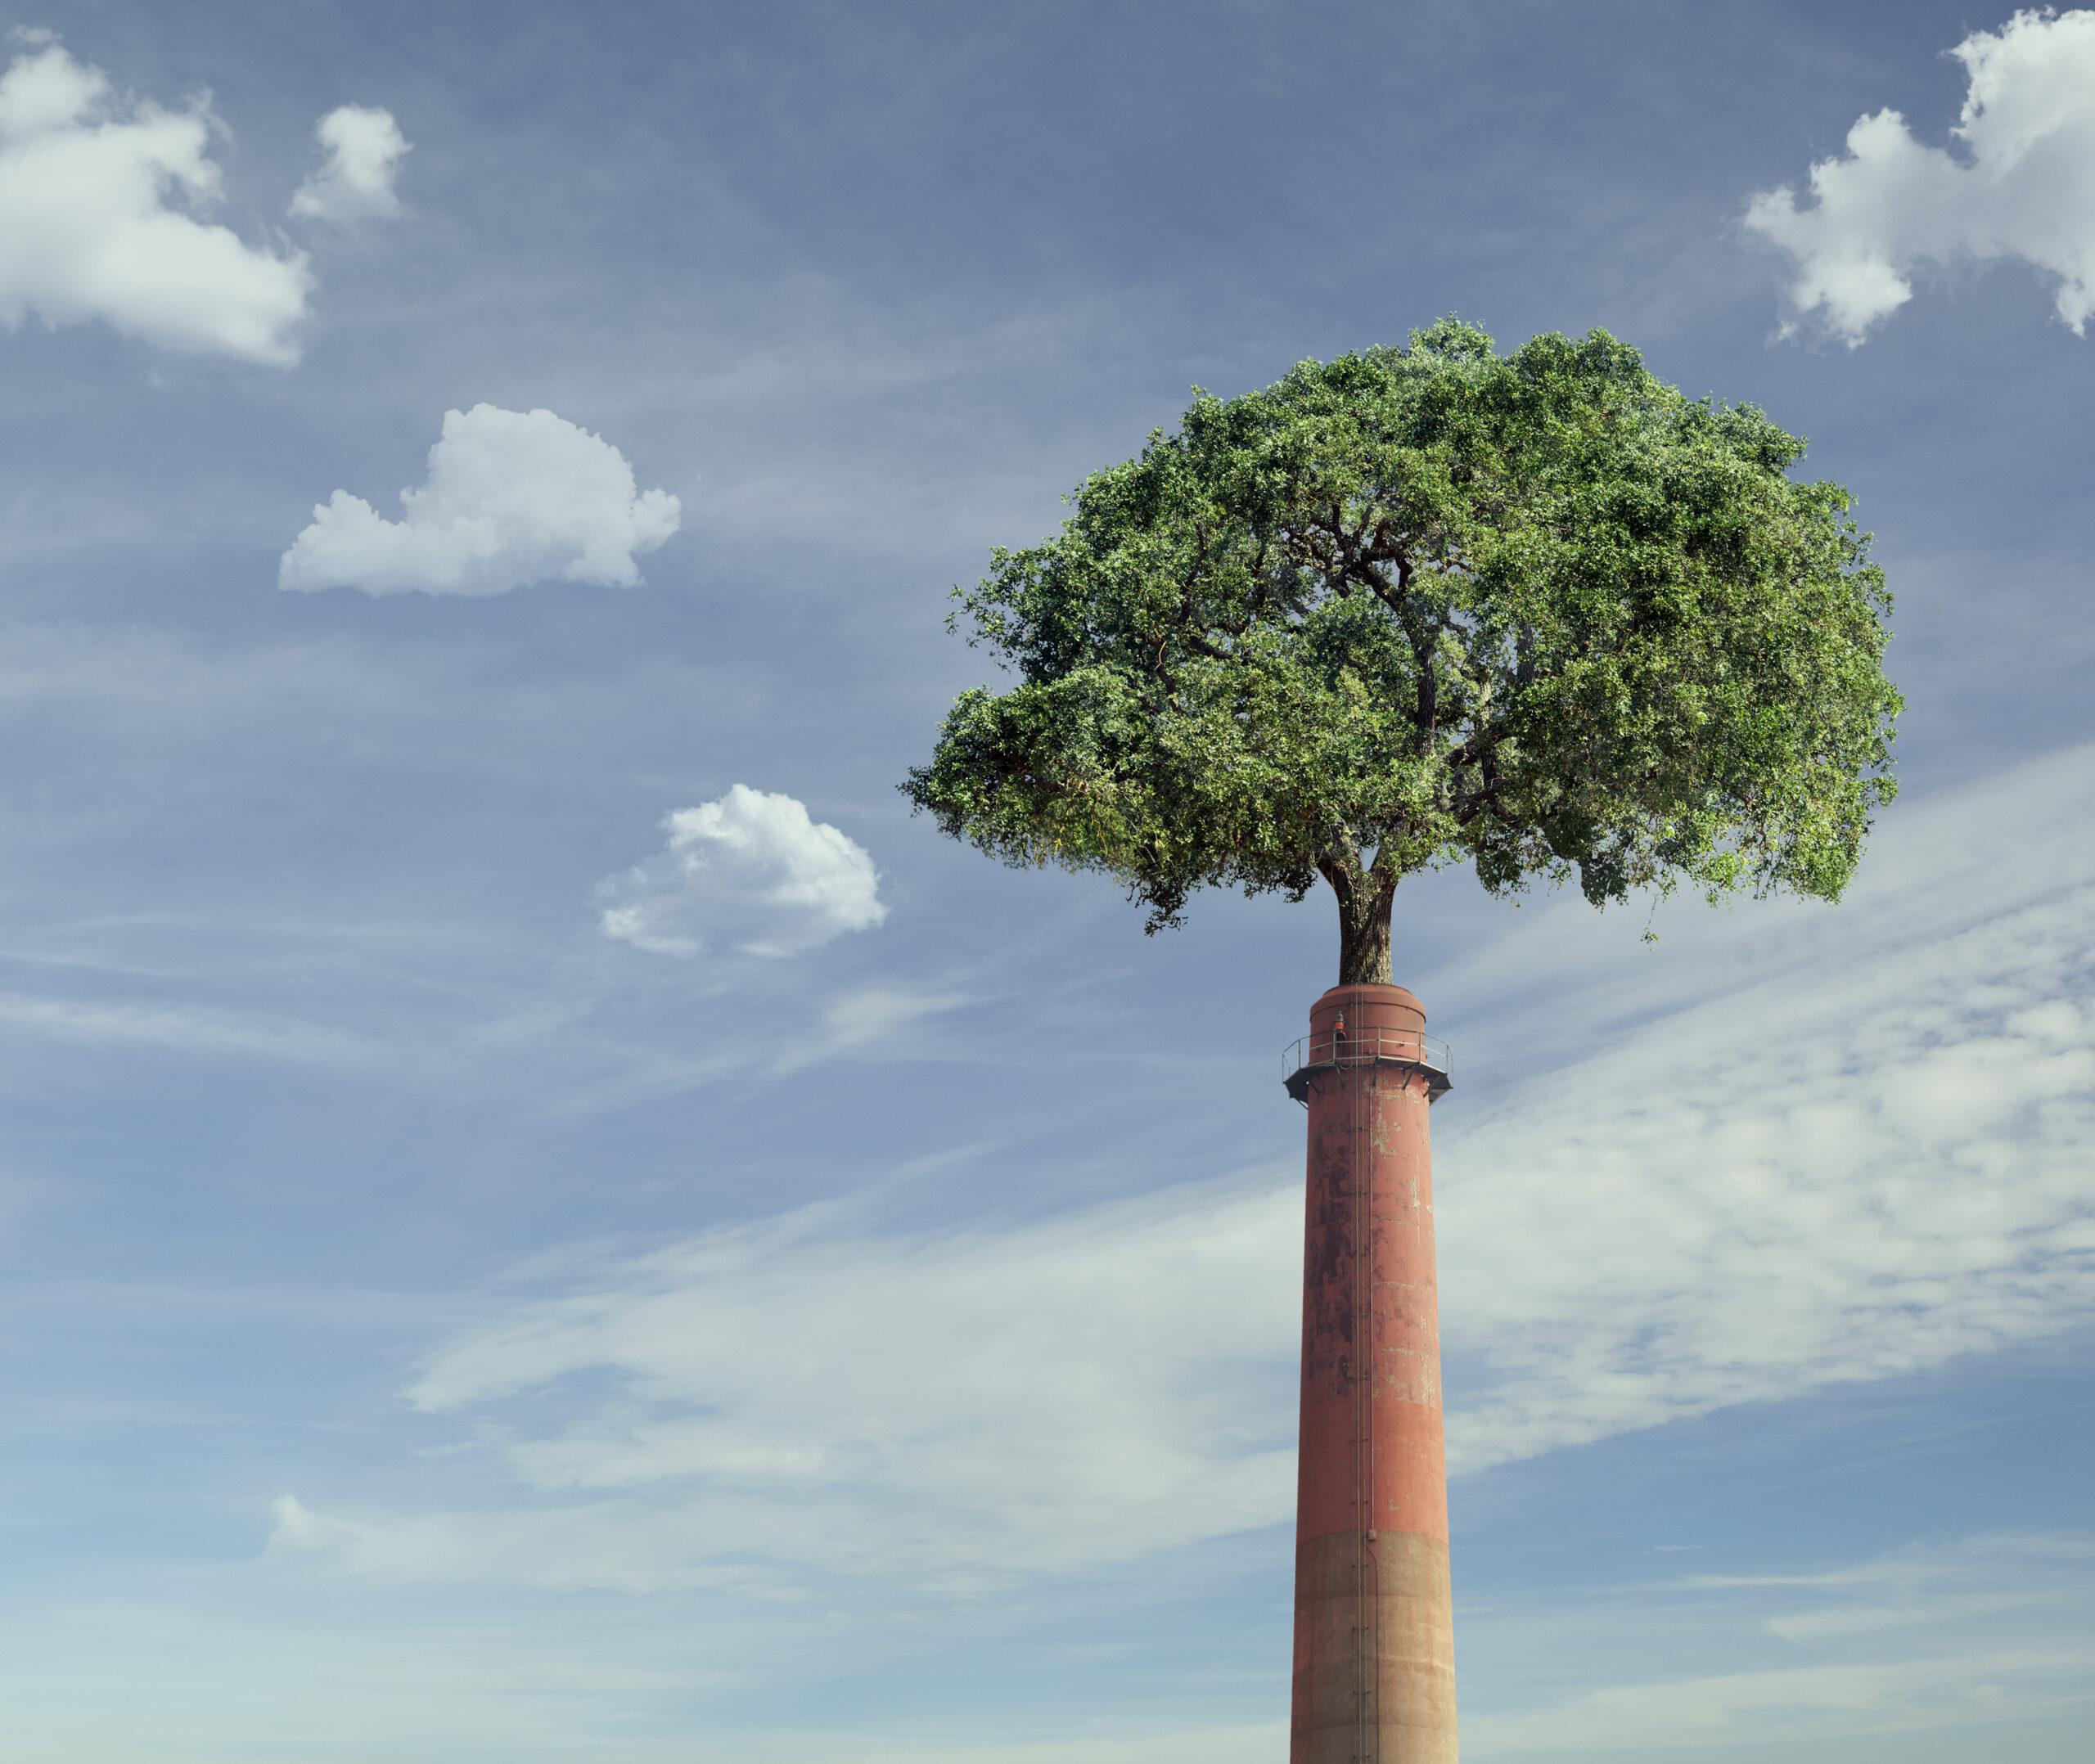 Träd växer ur skorsten.